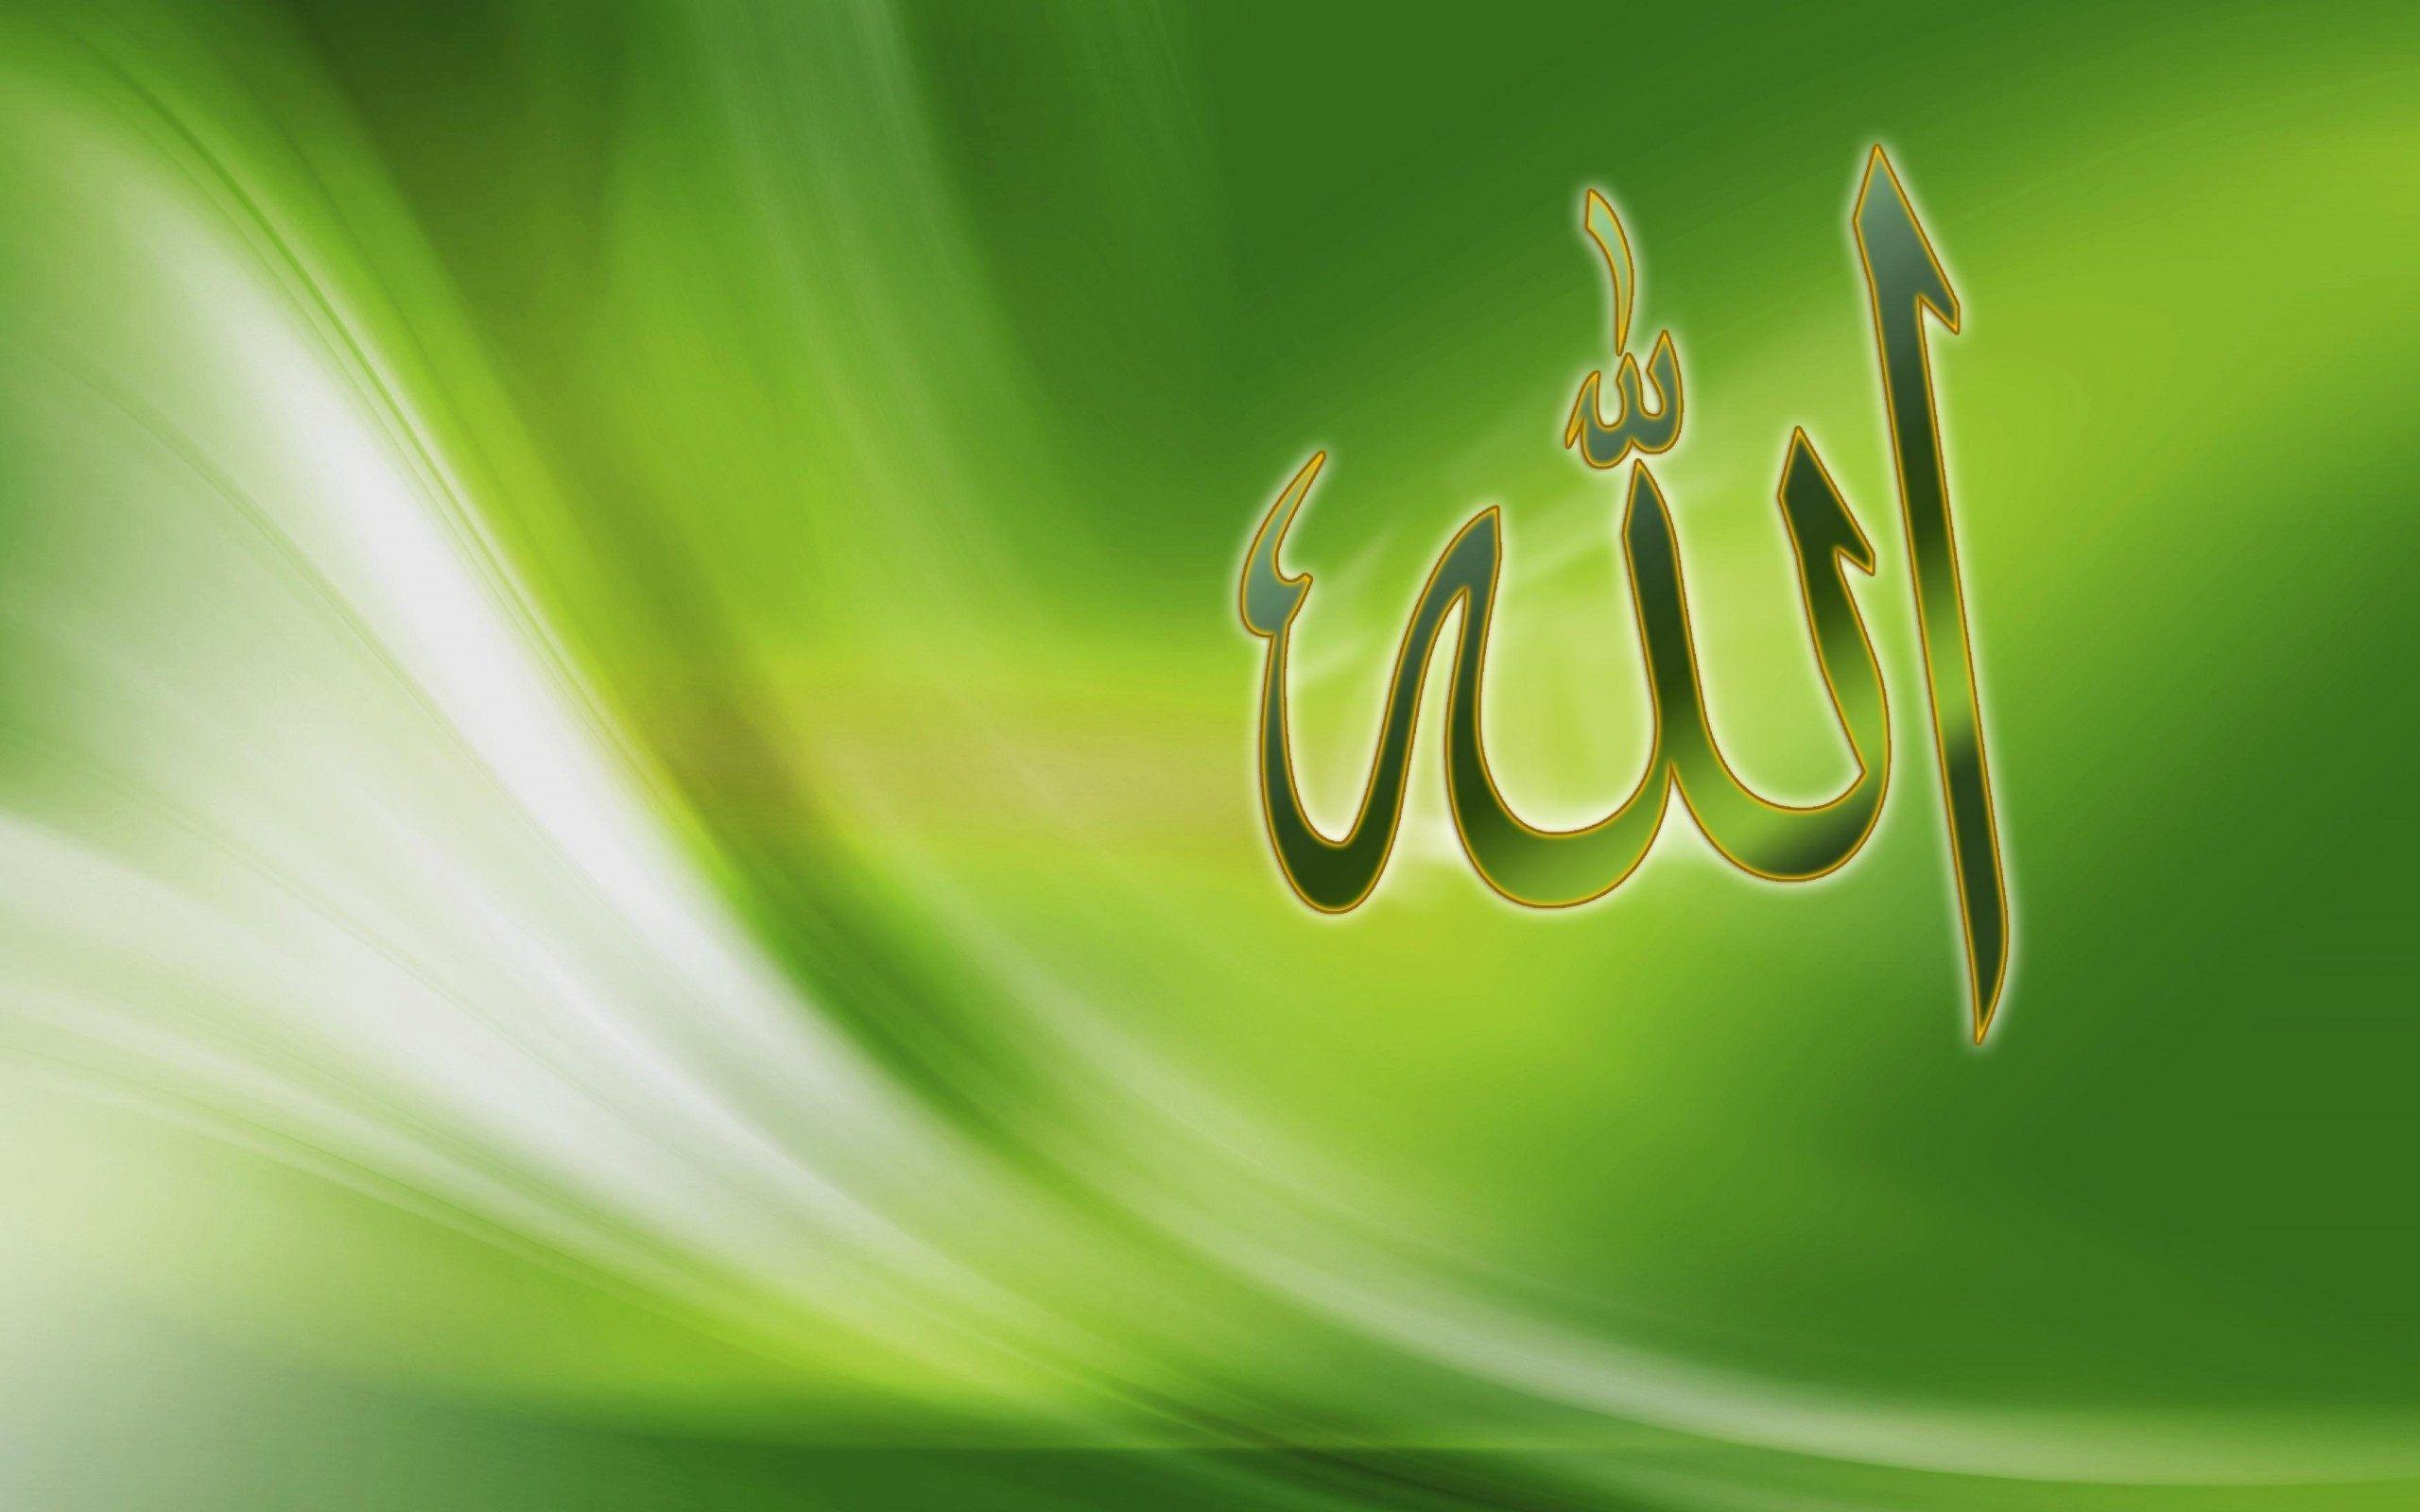 My Name 3d Wallpapers: Allah Name Wallpapers 2016